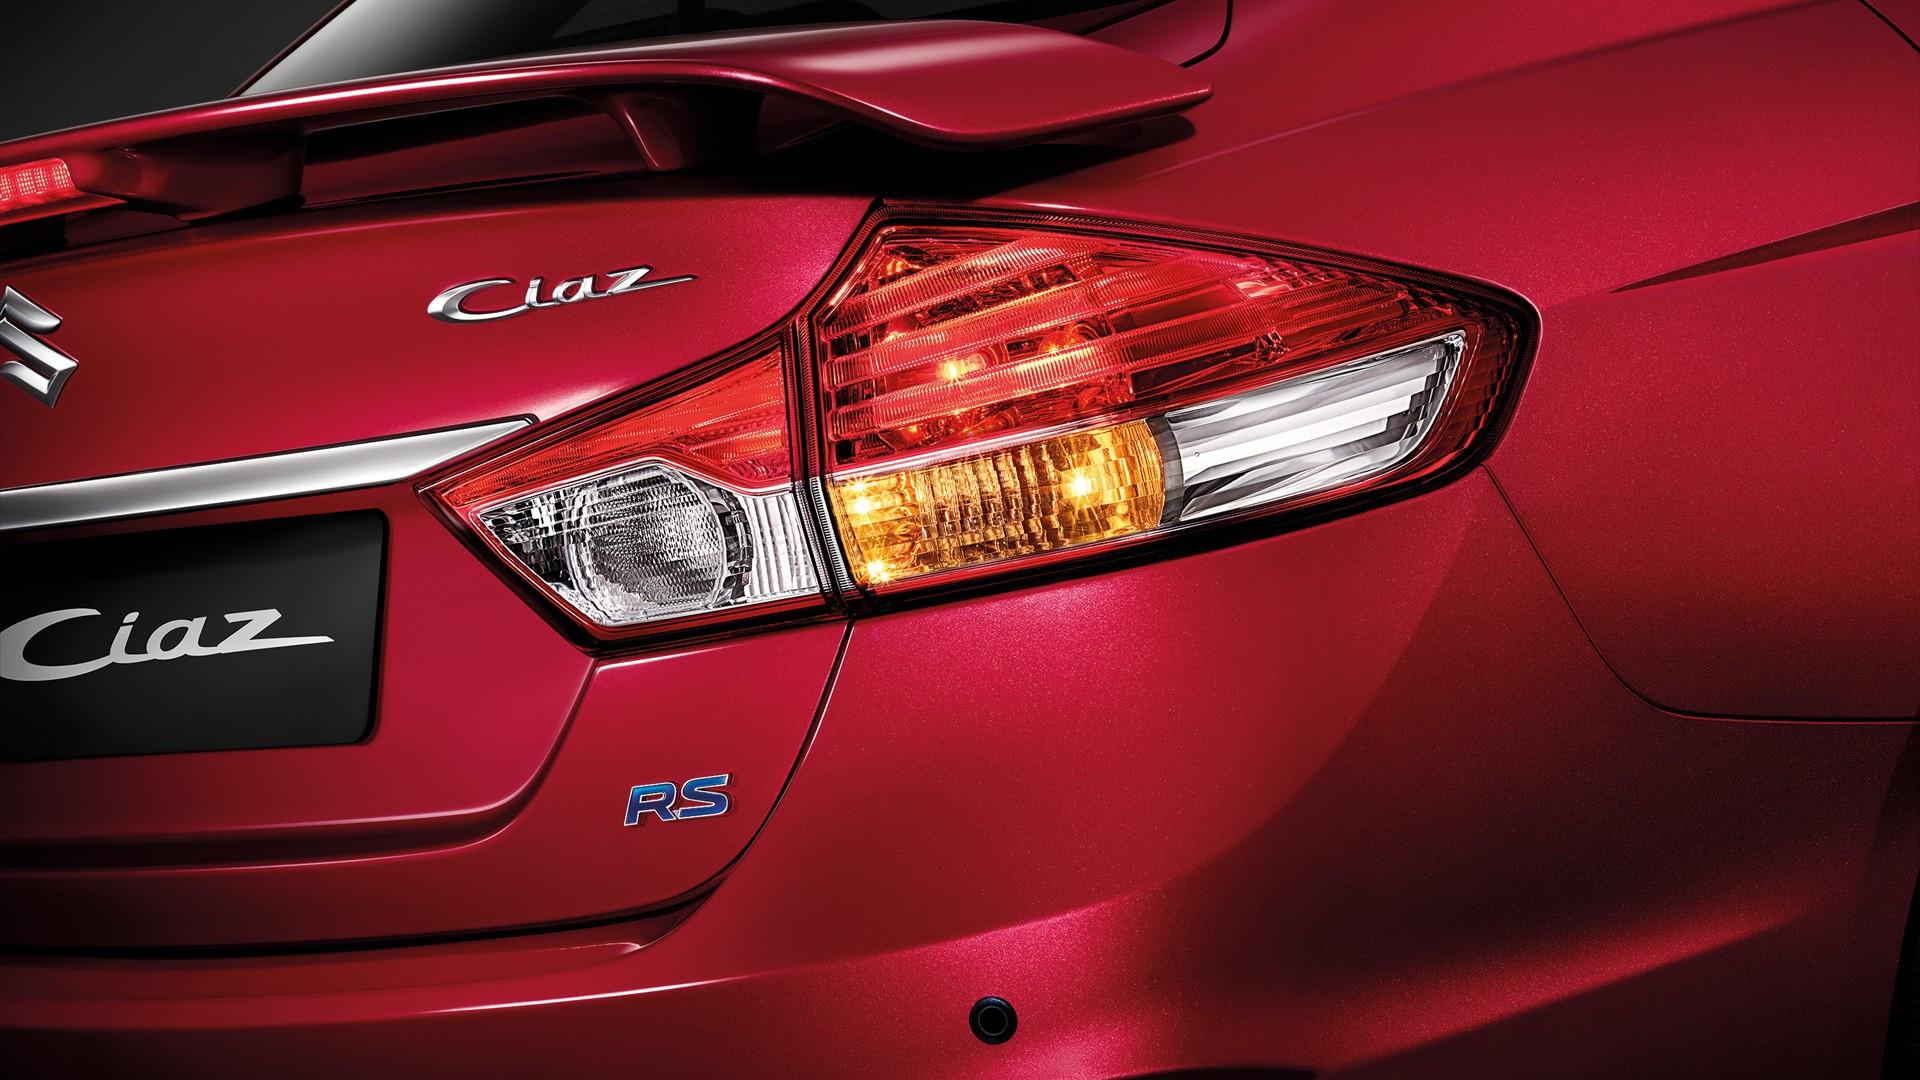 Suzuki Ciaz ไฟท้ายดีไซน์โดดเด่น